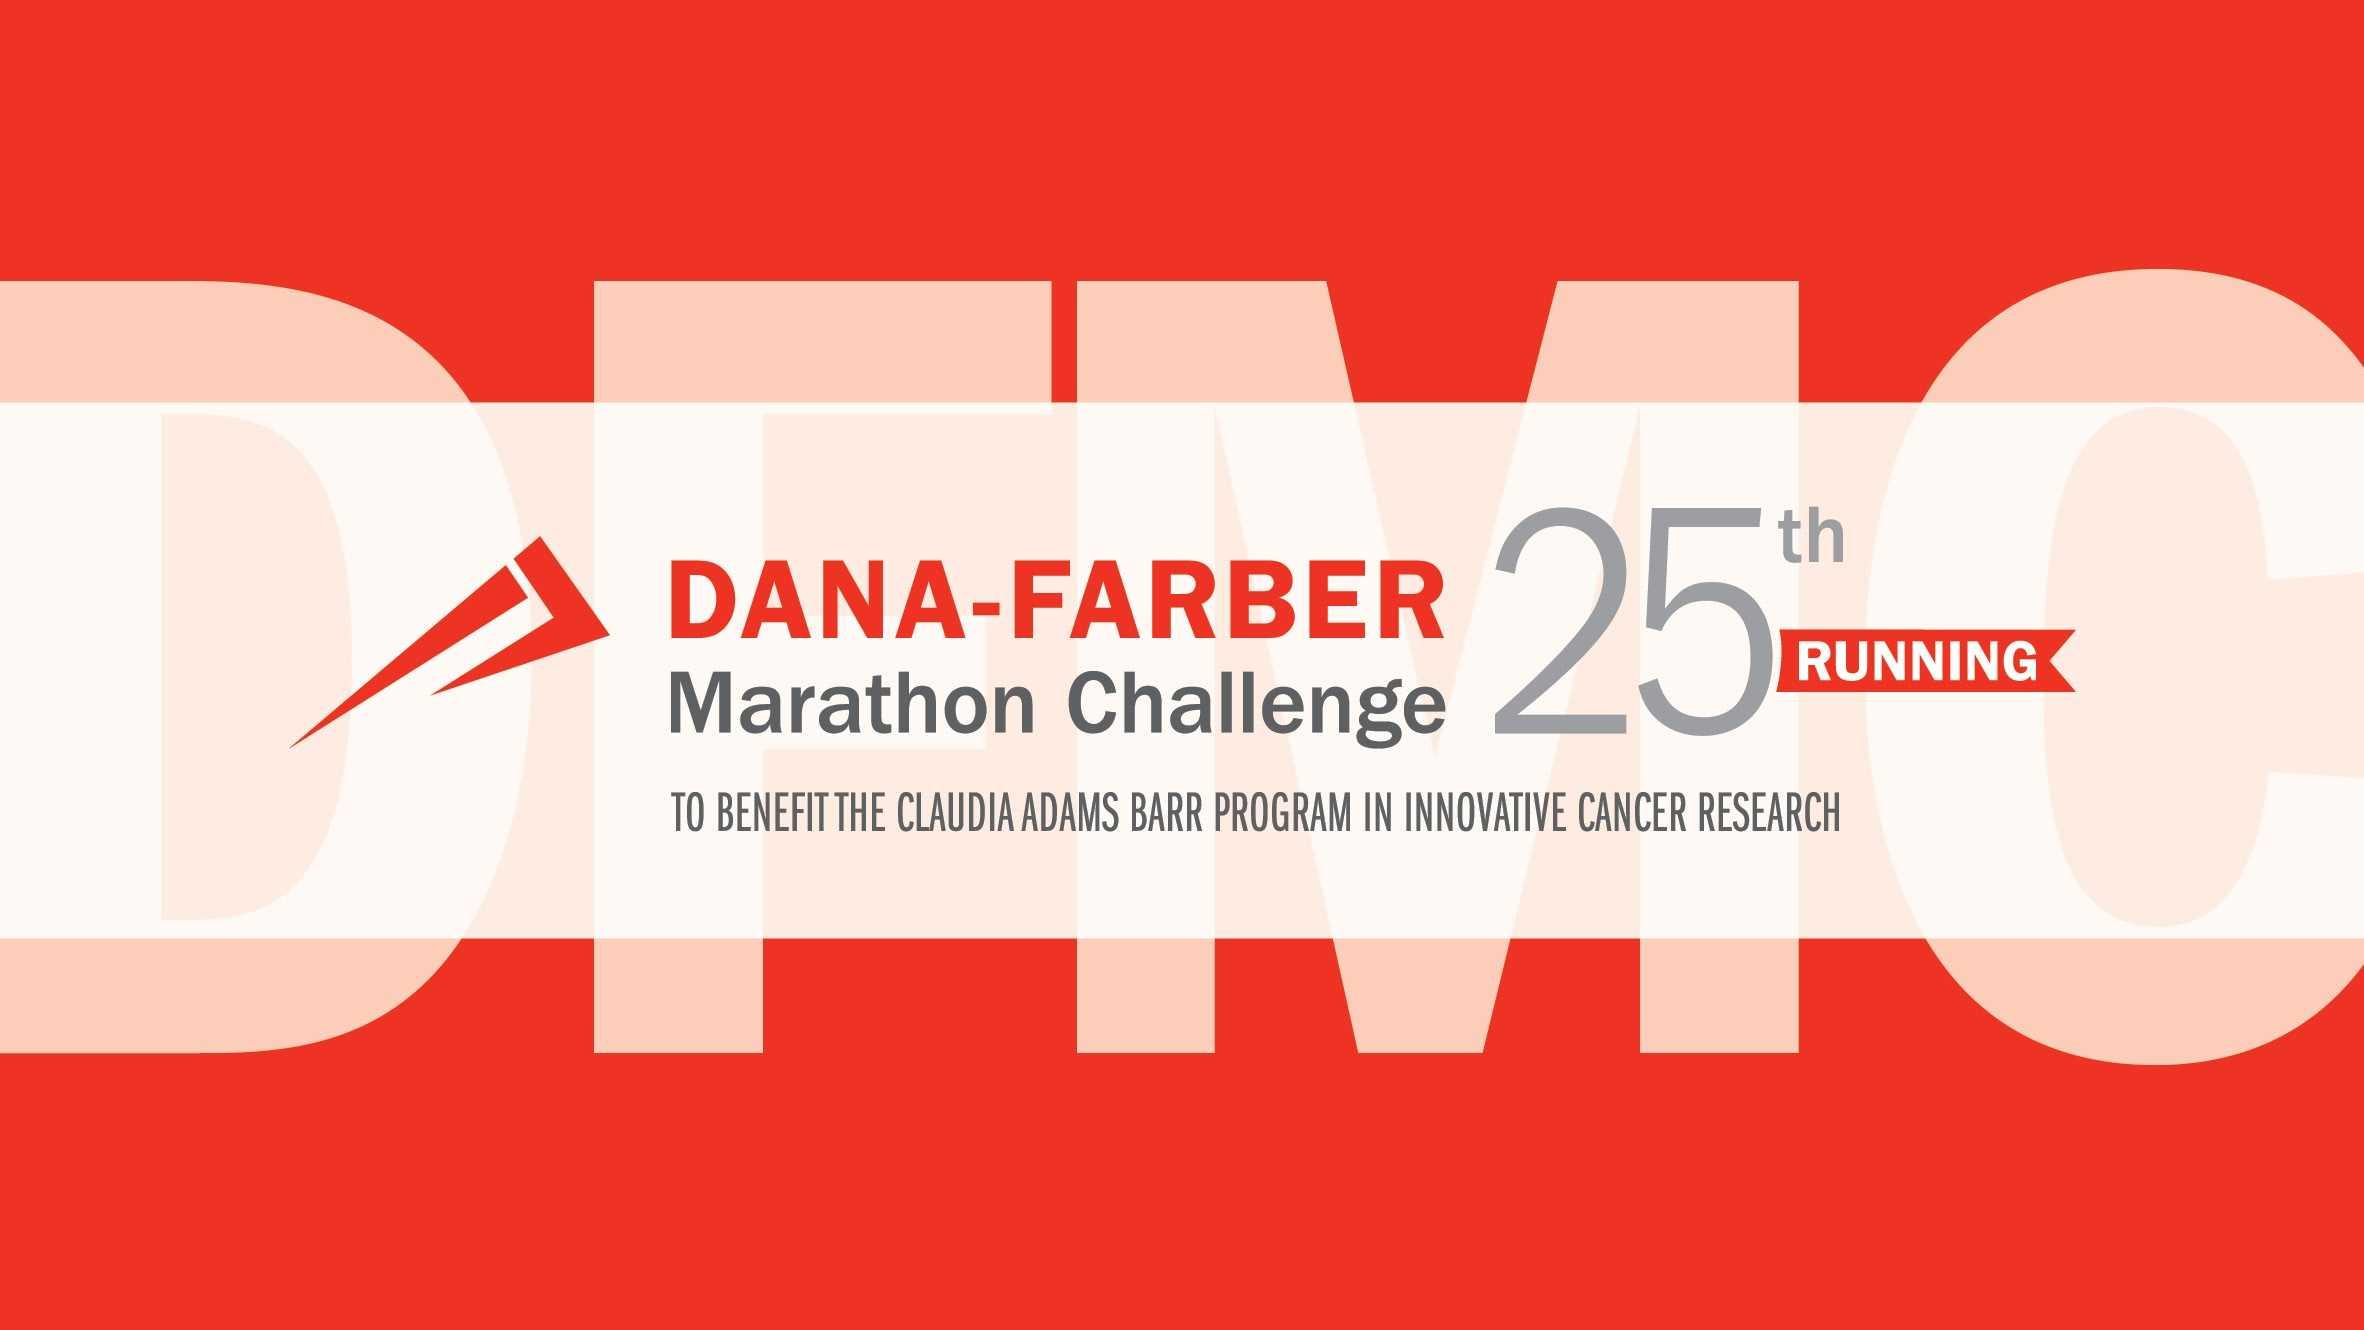 Dana Farber fundraising logo 2.24.14